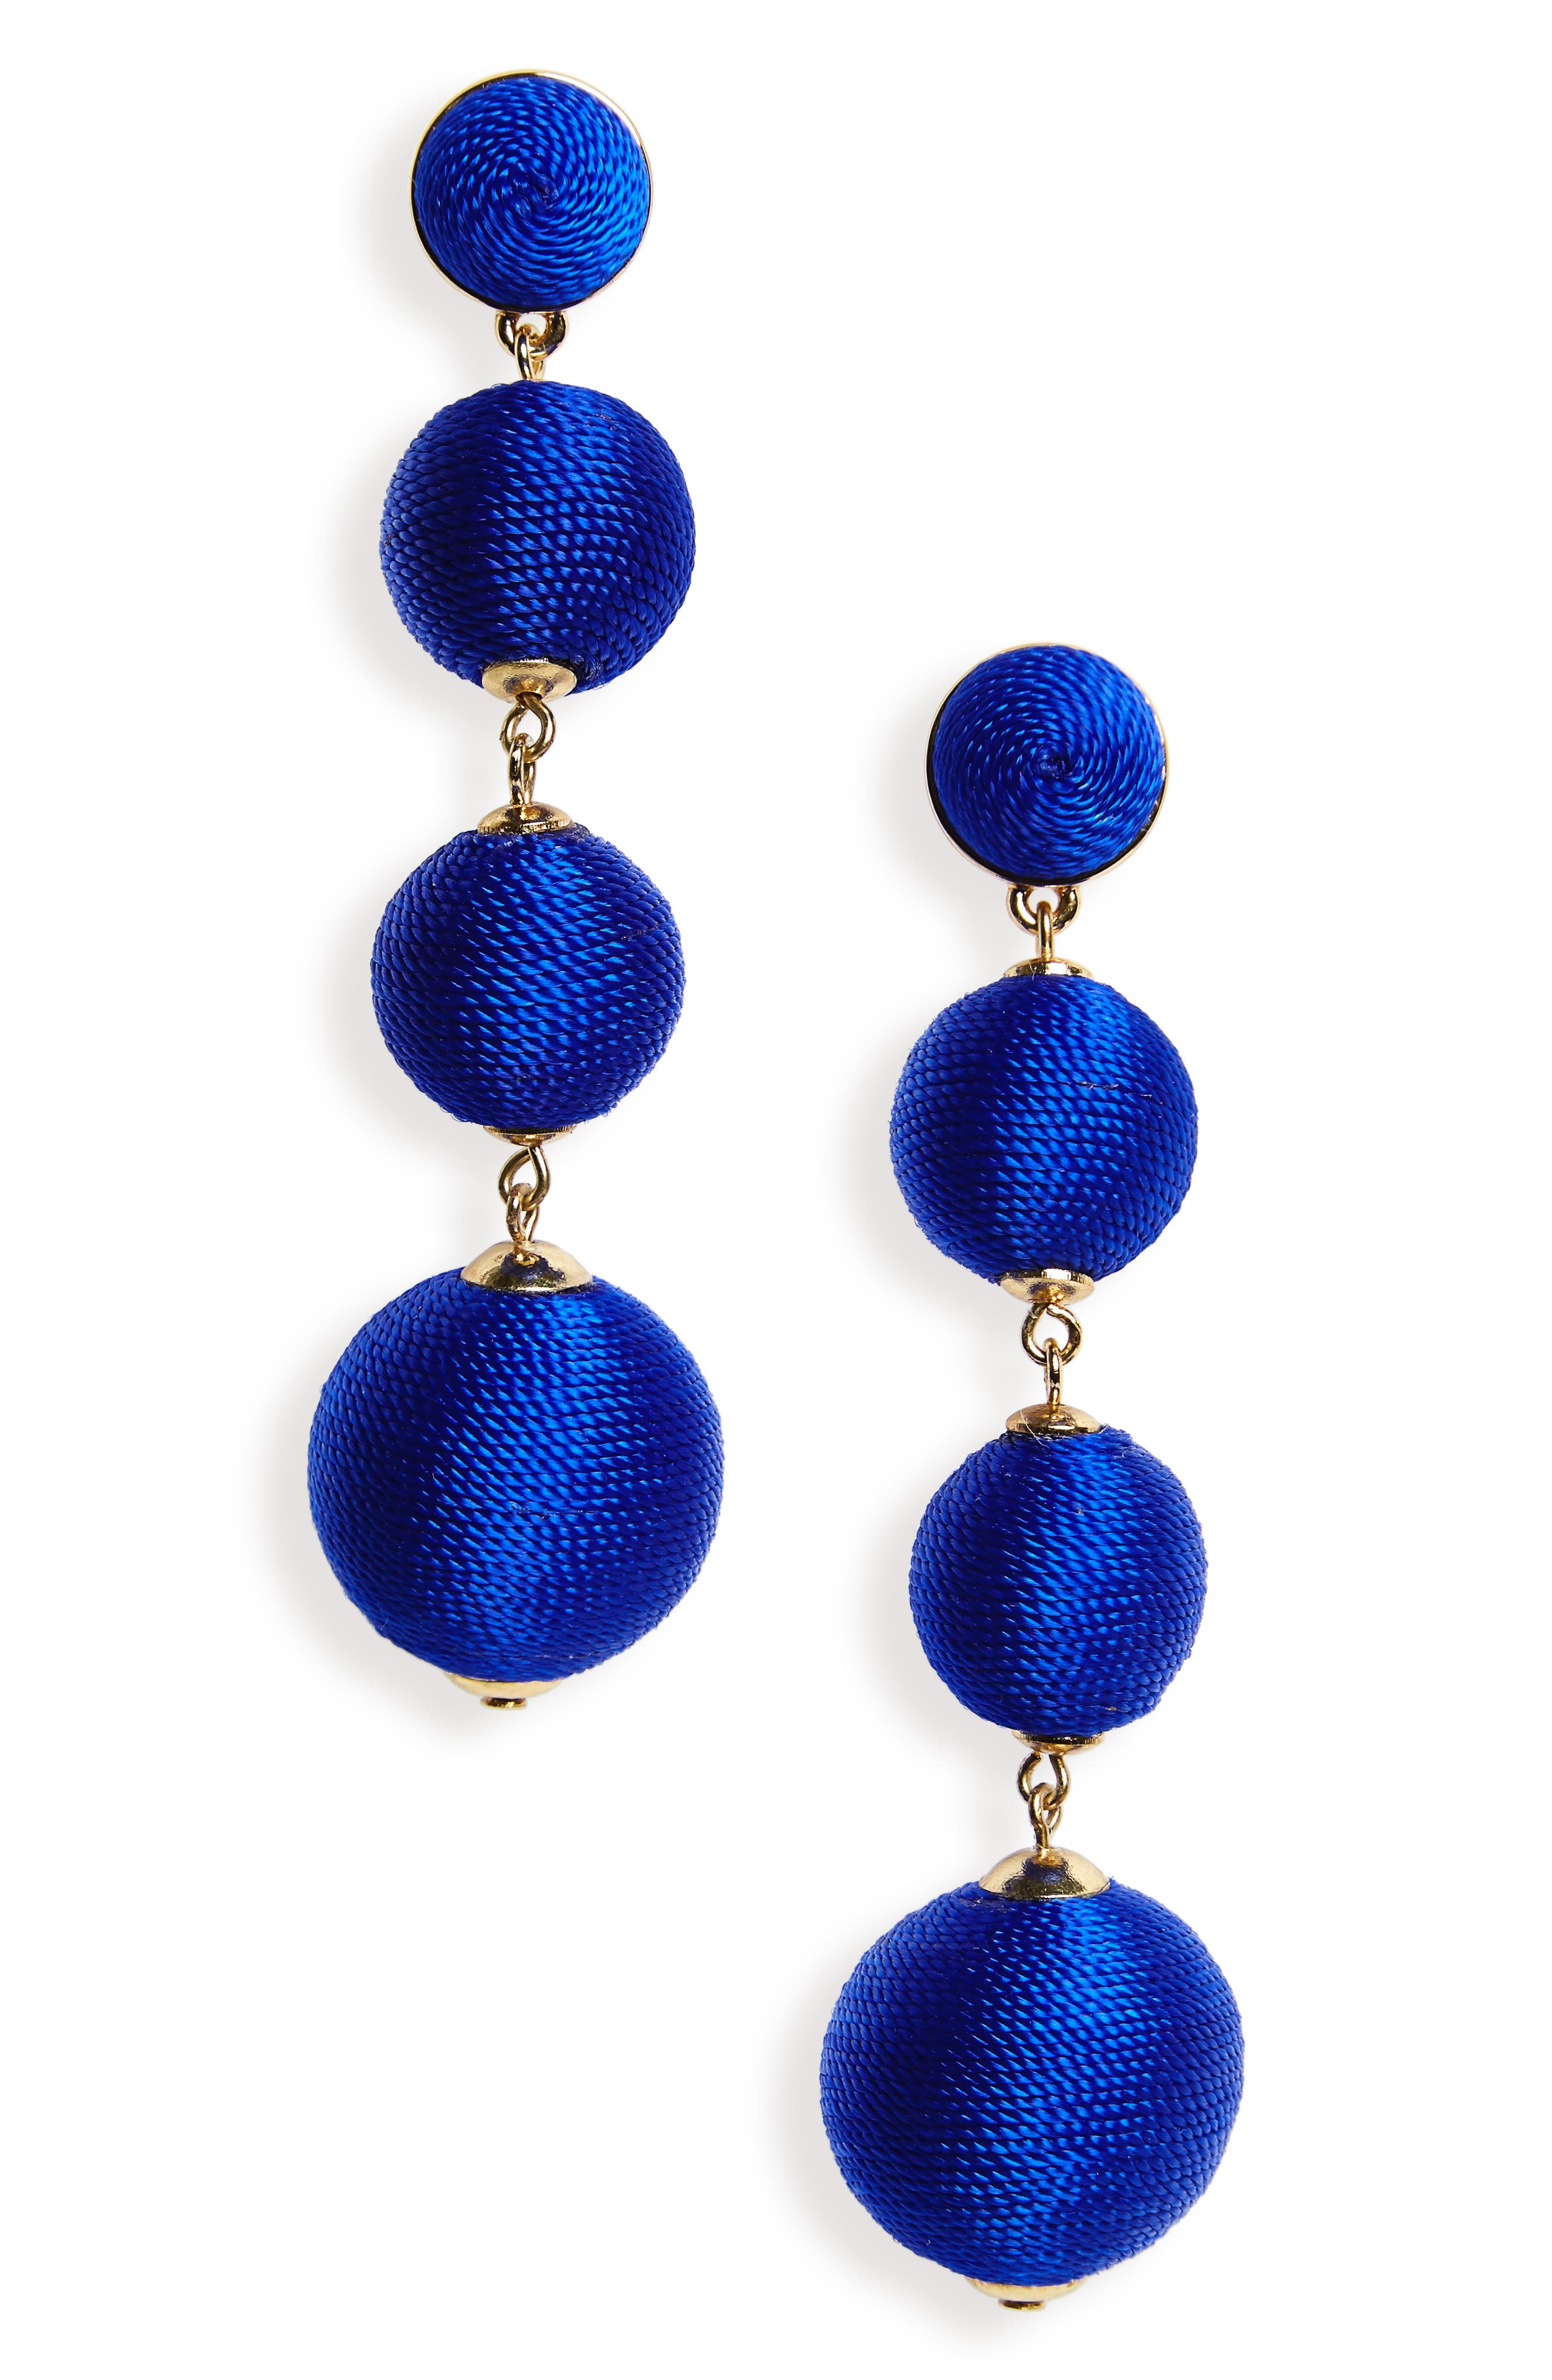 Criselda Ball Shoulder Duster Earrings,                             Main thumbnail 4, color,